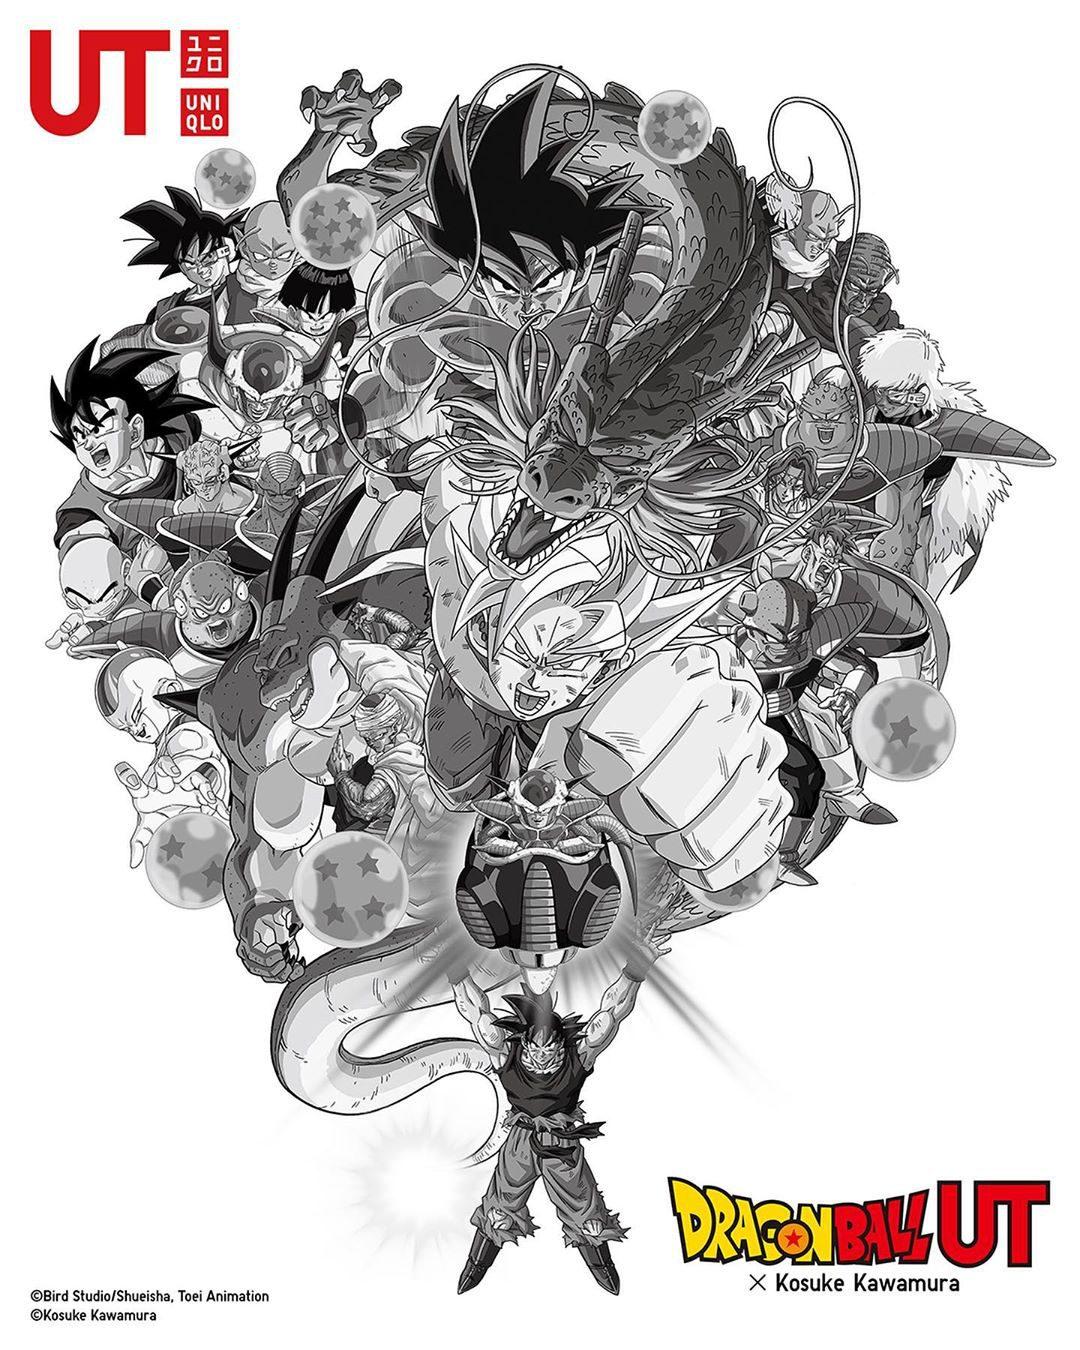 UNIQLO UT x Dragon Ball Z x Kosuke Kawamura